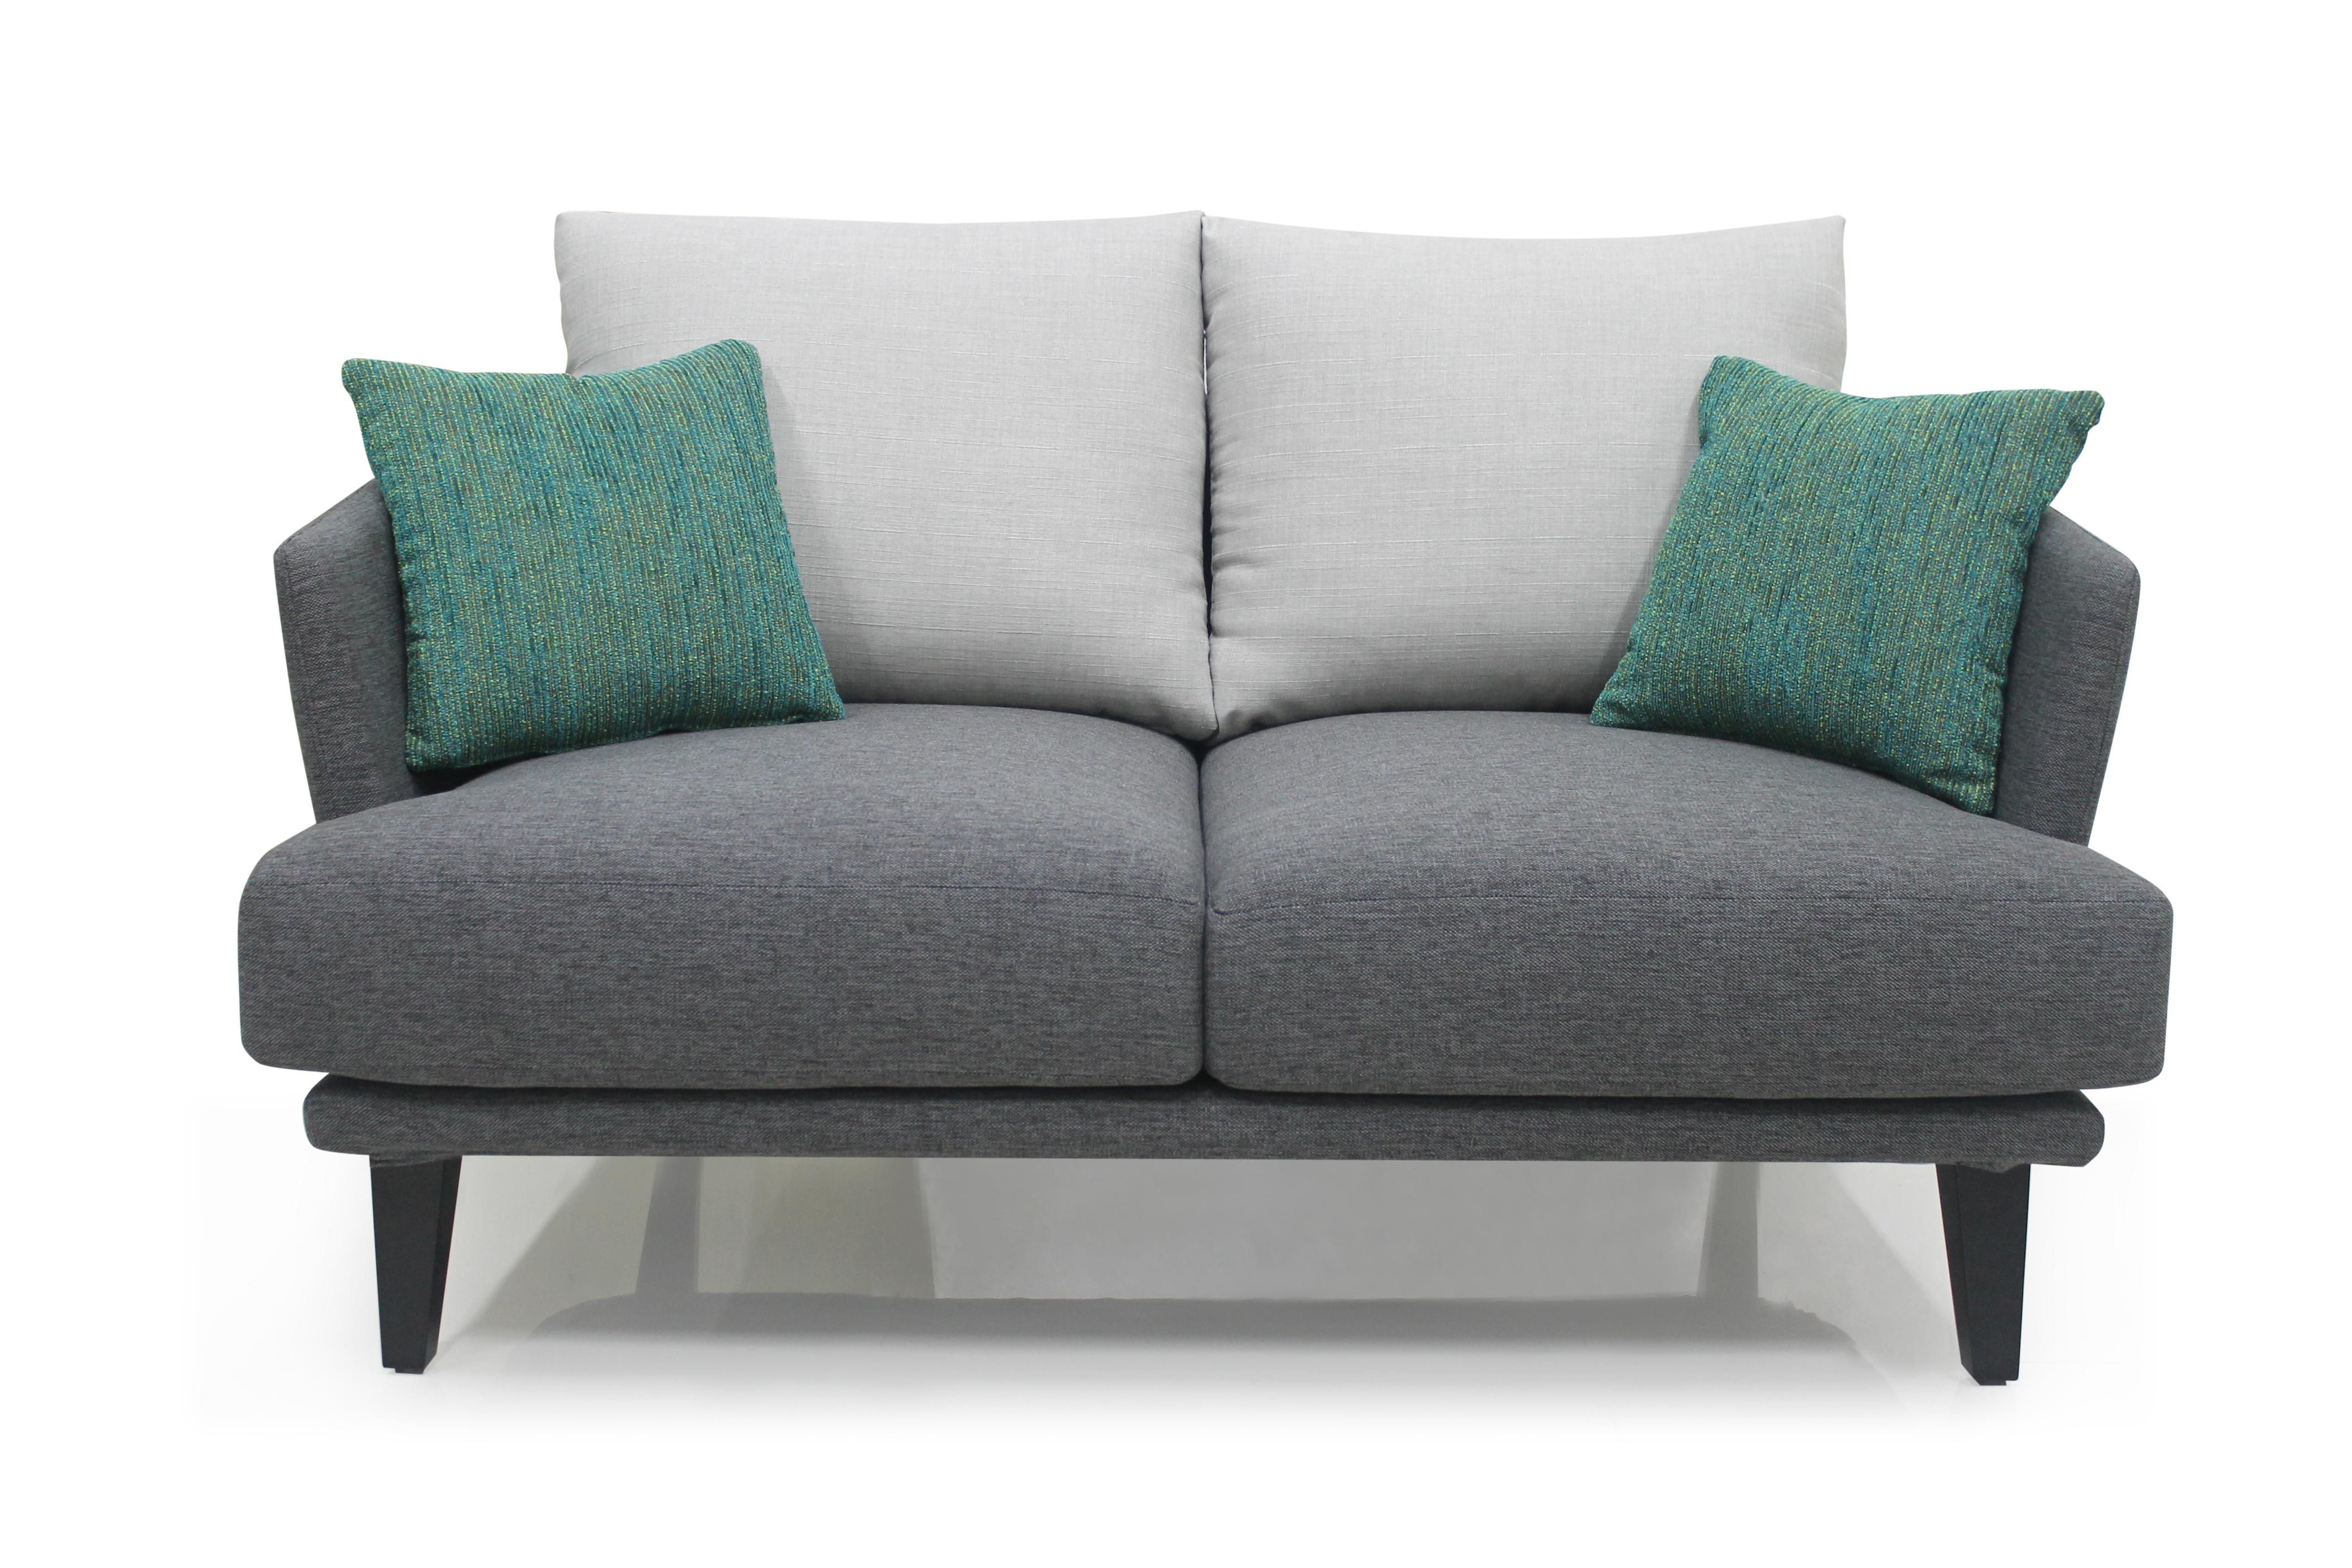 Product Hd 2216 Sofa Expats Furniture Rental